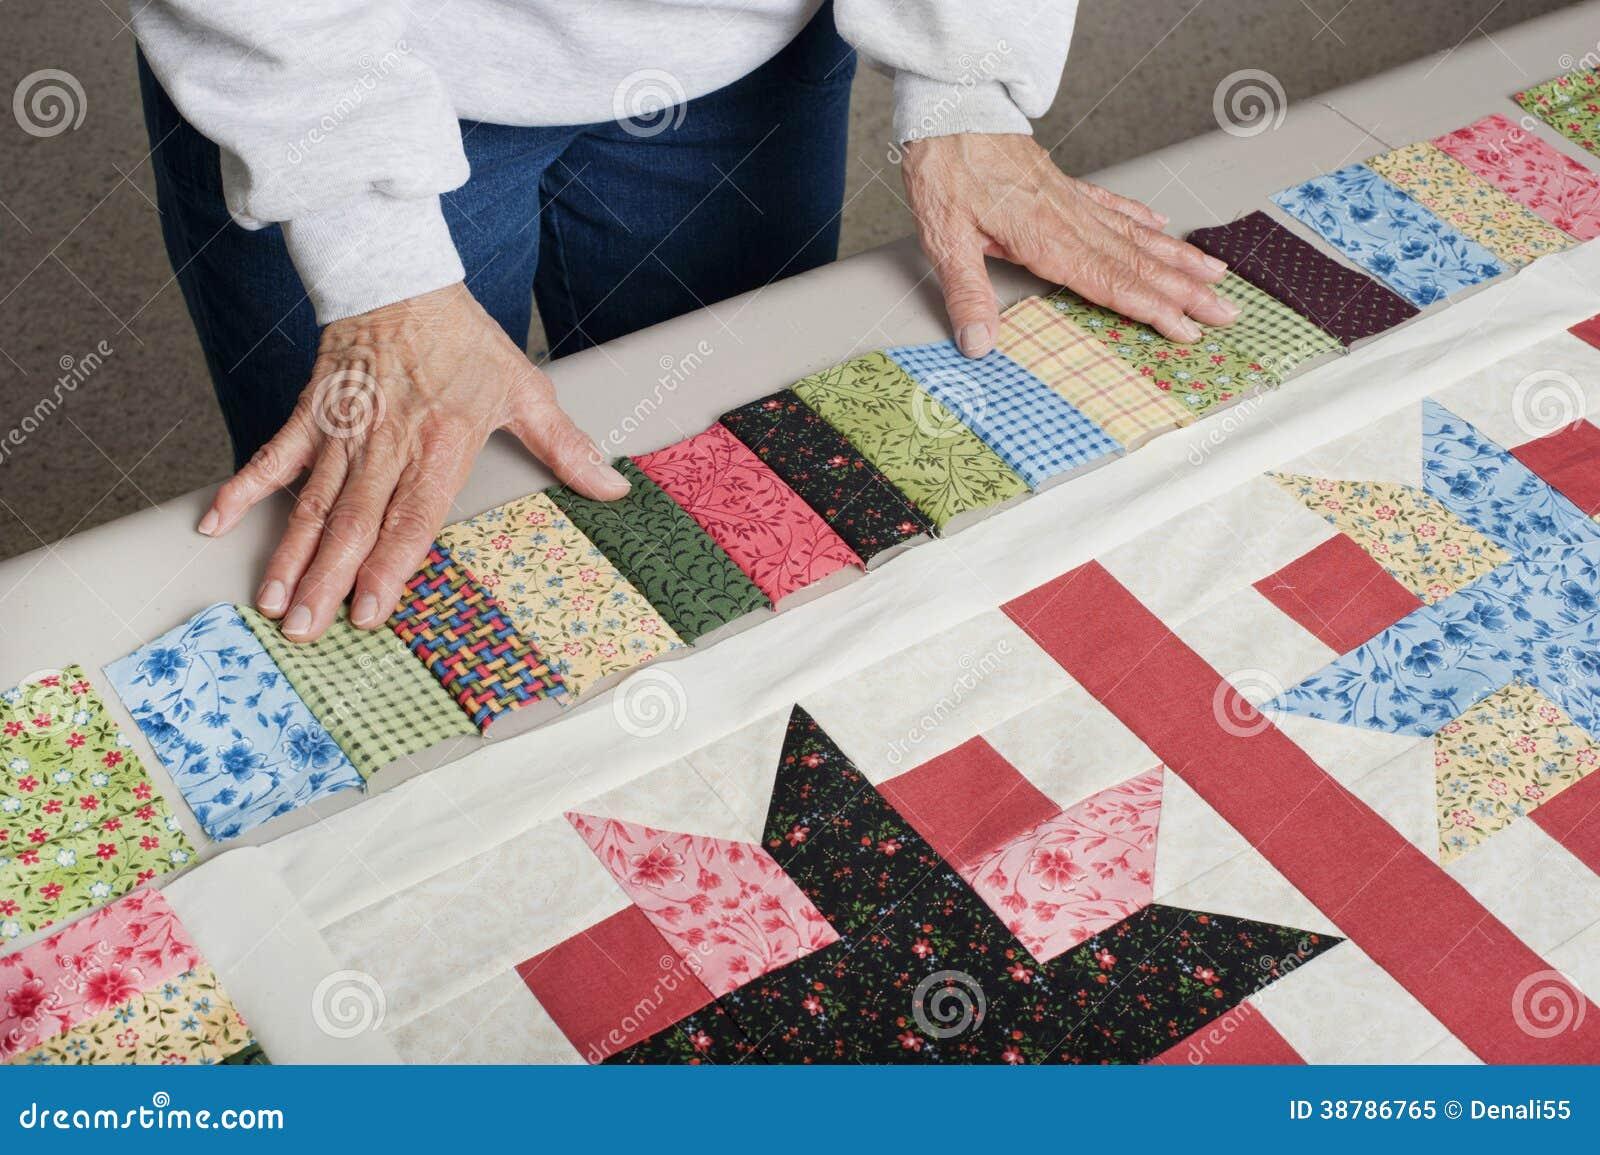 Arranging Fabric For Piano Key Border. Stock Image - Image: 38786765 : piano key quilt border - Adamdwight.com